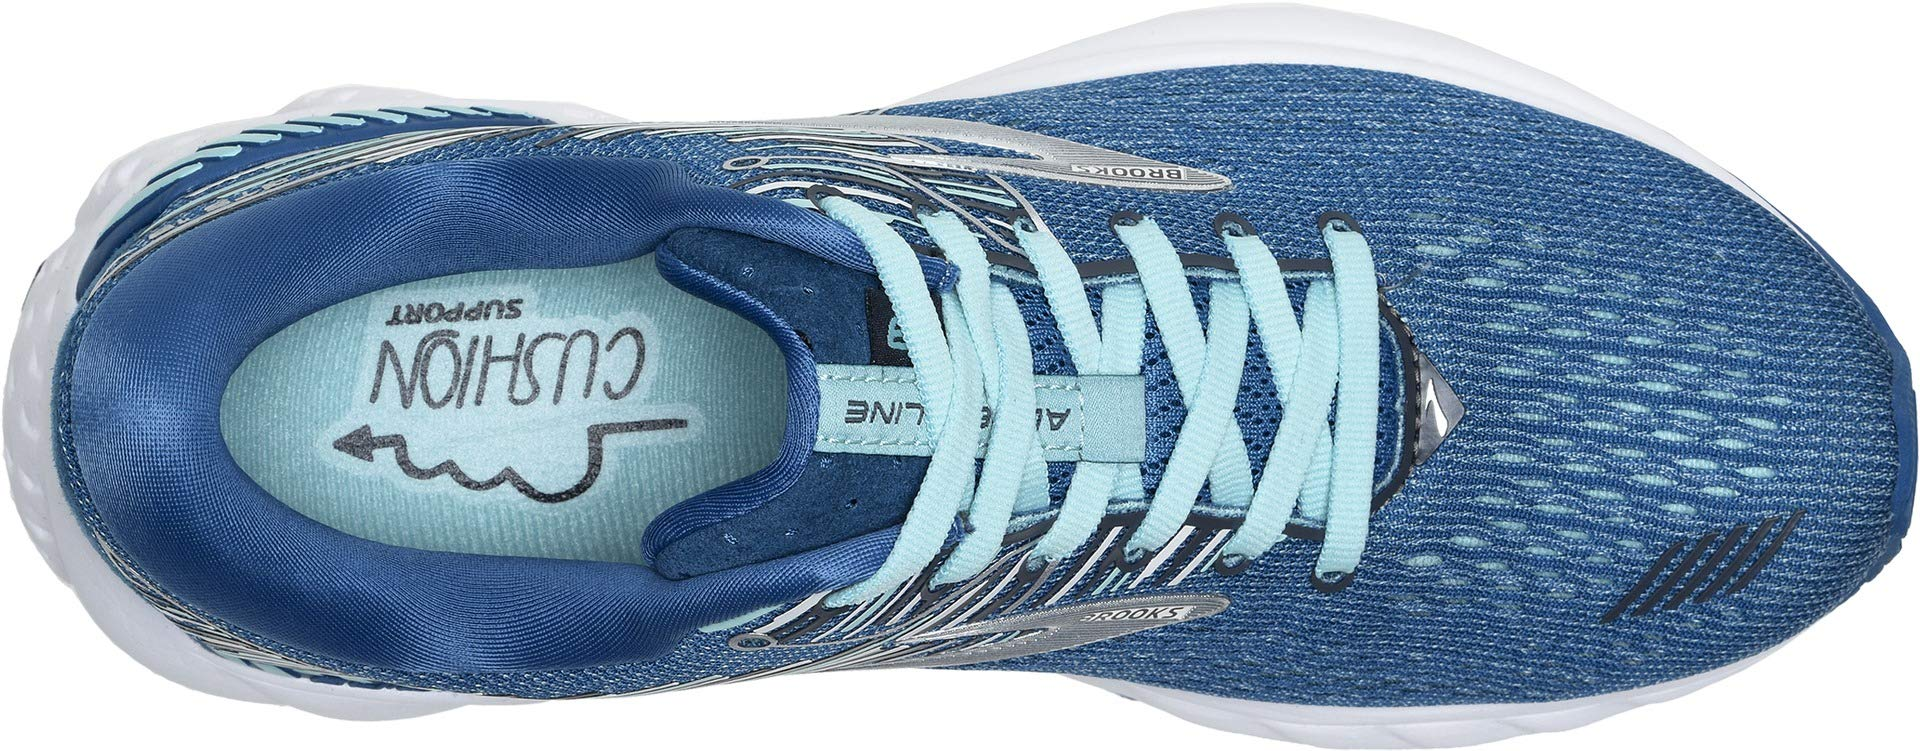 Brooks Women's Adrenaline GTS 19 Blue/Aqua/Ebony 5 B US by Brooks (Image #2)